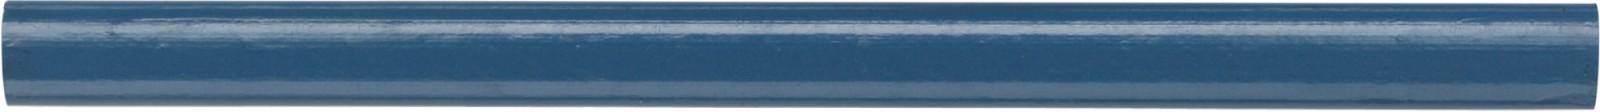 Wooden carpenter's pencil - Cobalt Blue